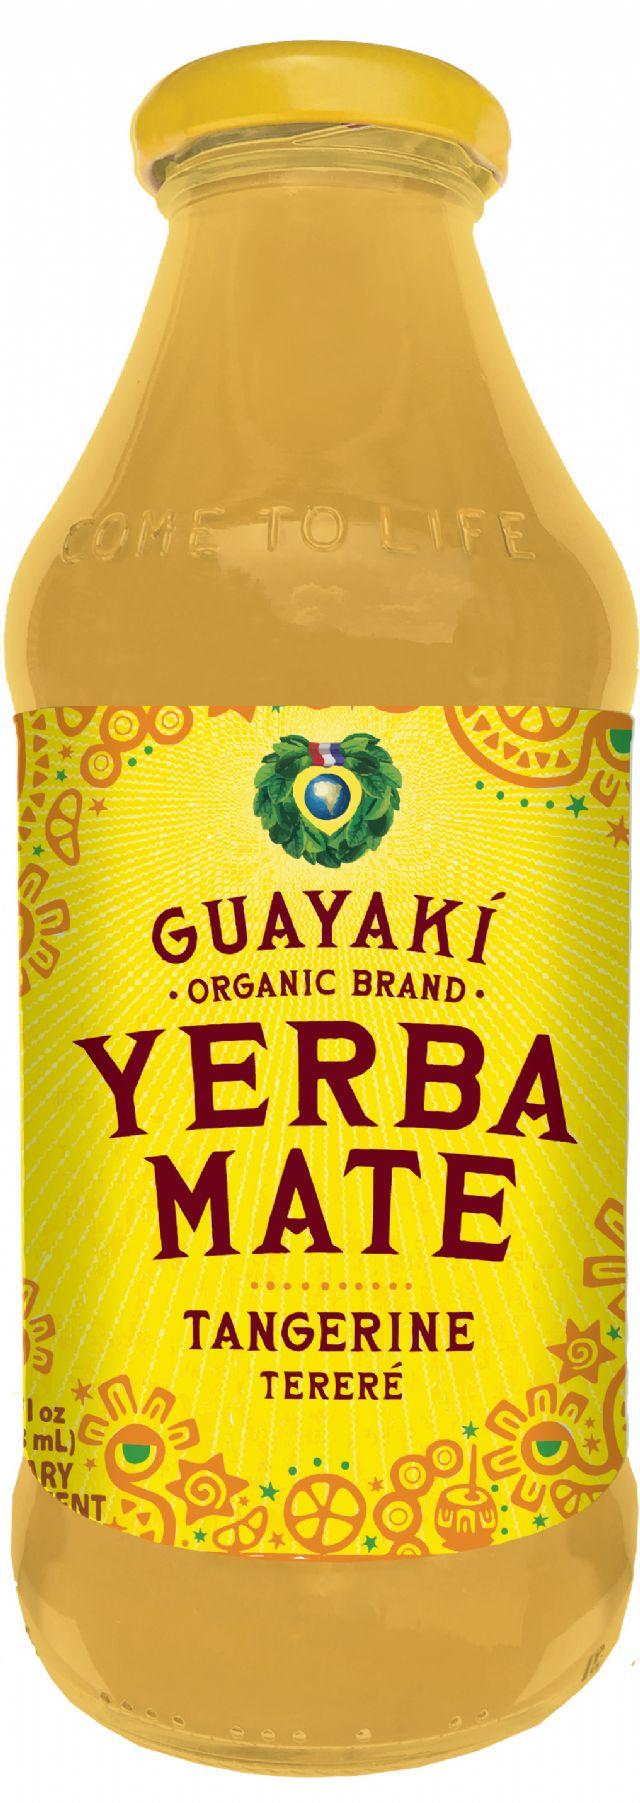 Guayakí Yerba Mate Organic Energy Drink: tangerine 2015